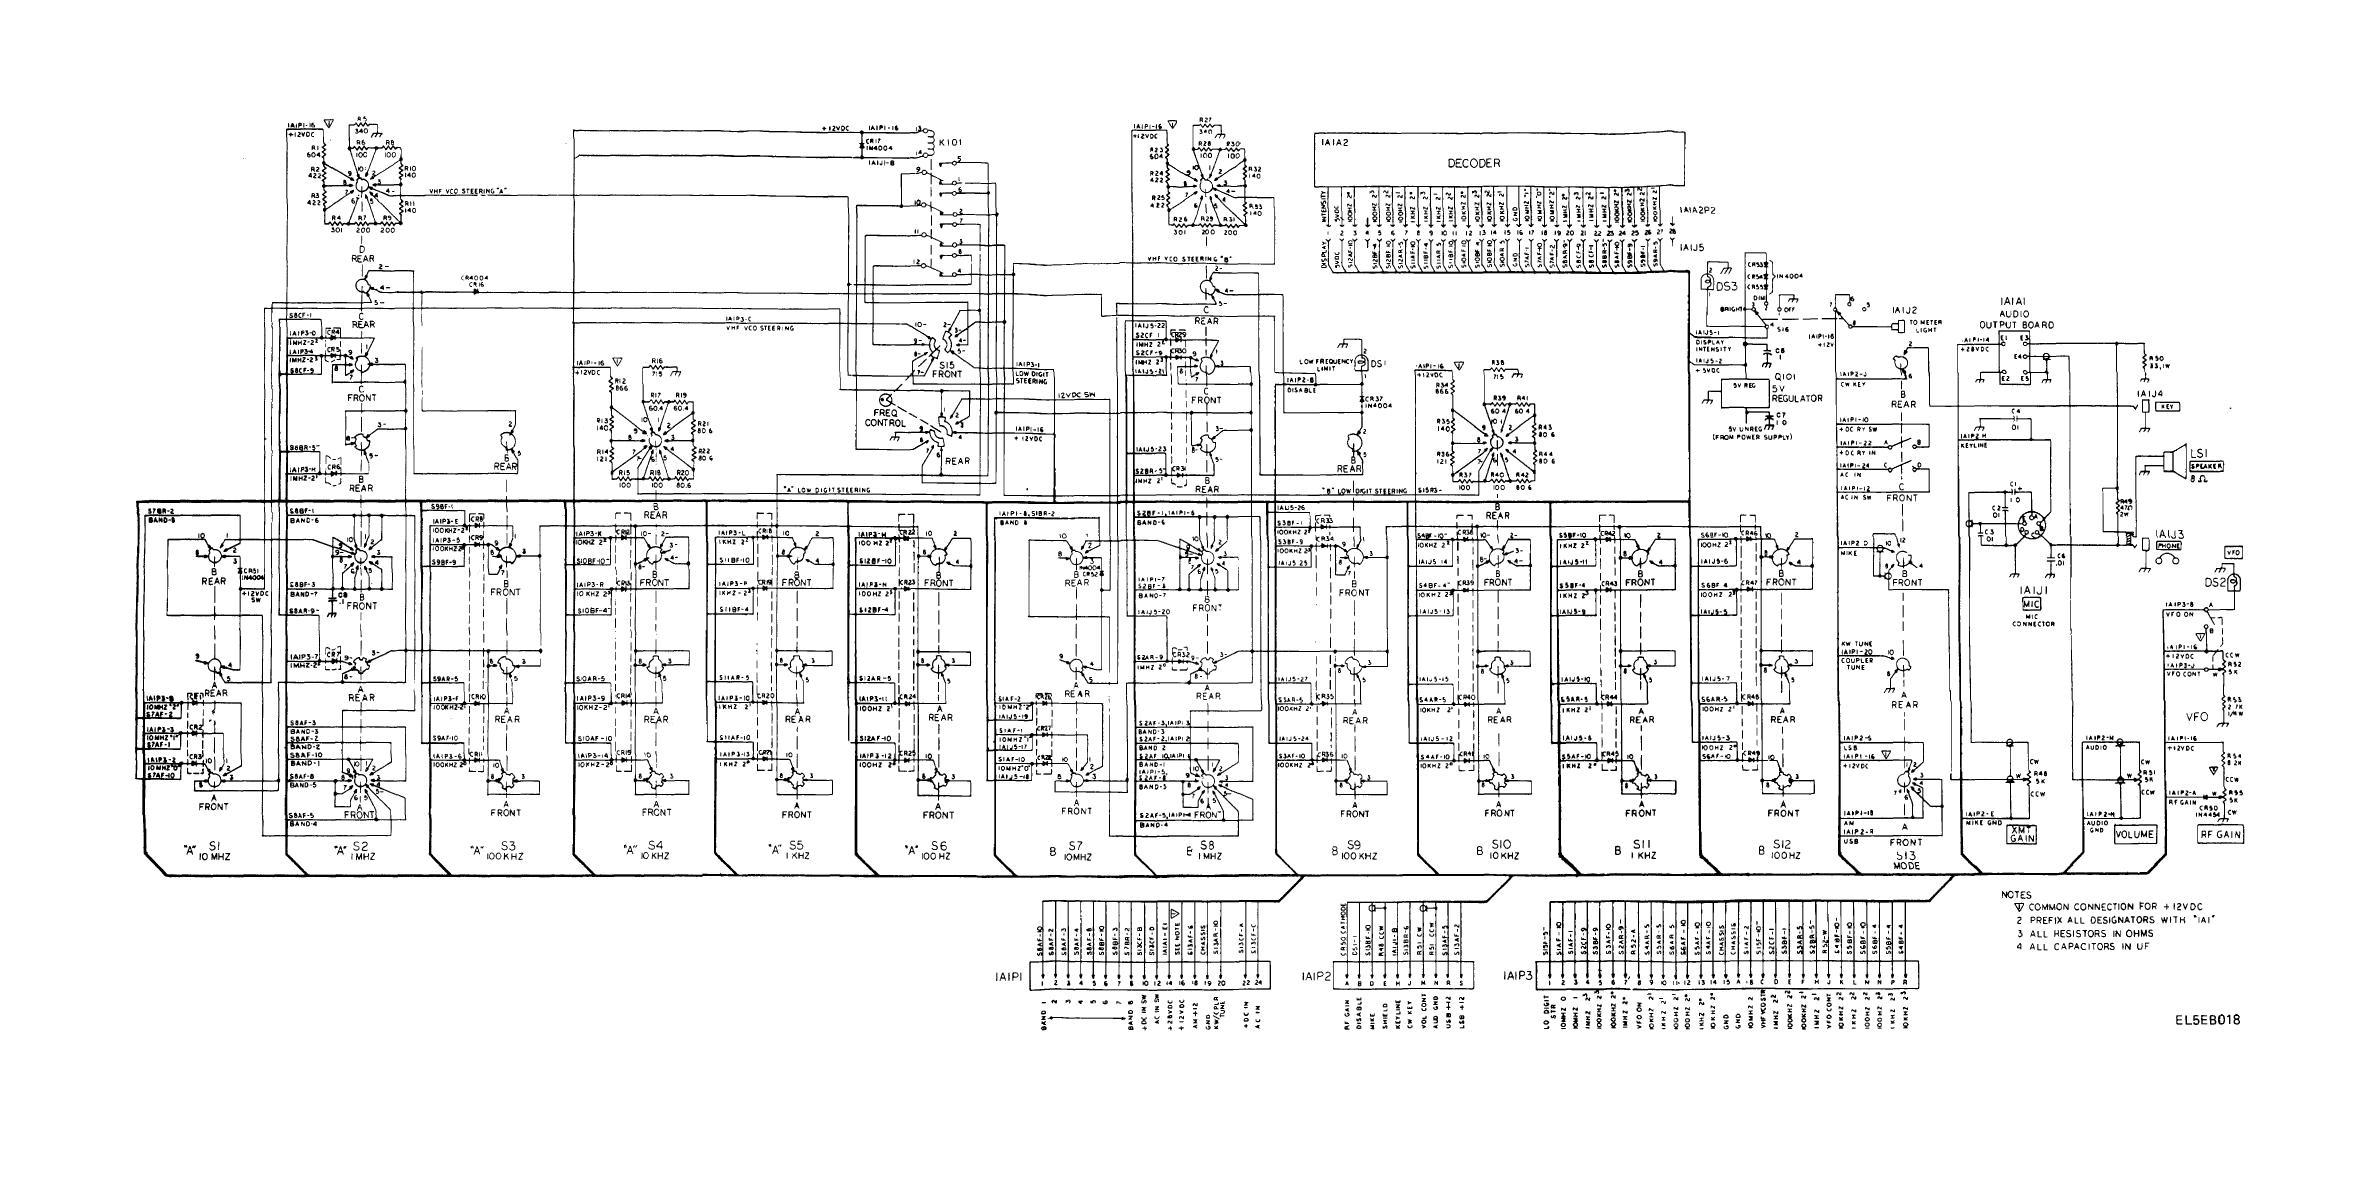 Fo 10 Half Duplex Front Panel Wiring Diagram